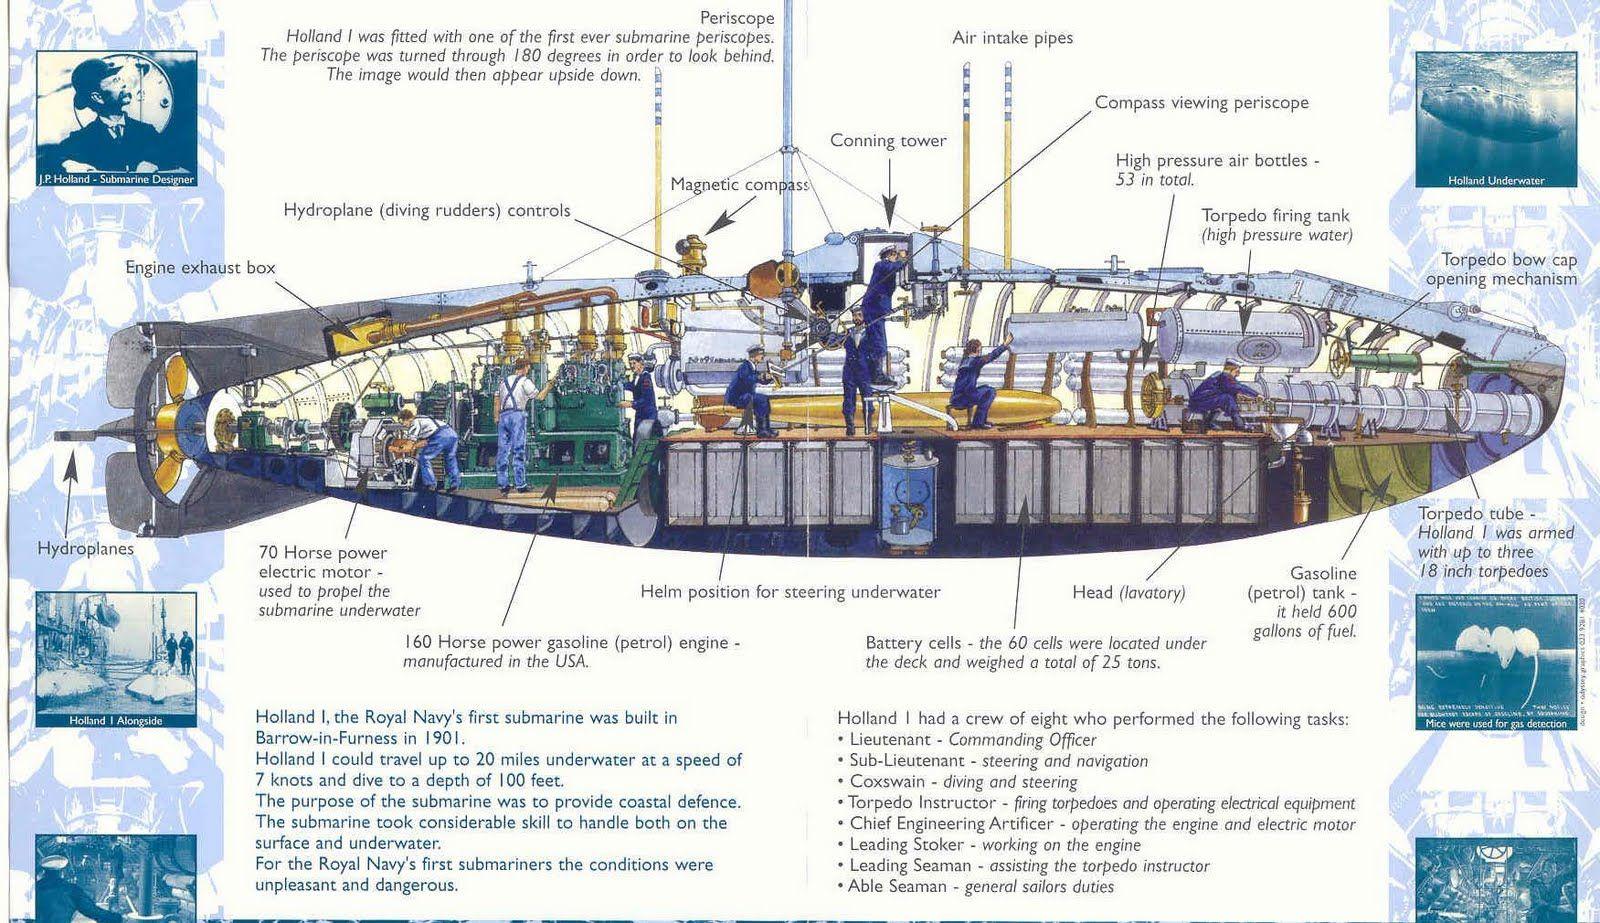 steampunk submarine schematic of the uss holland circa 1900 [ 1600 x 923 Pixel ]